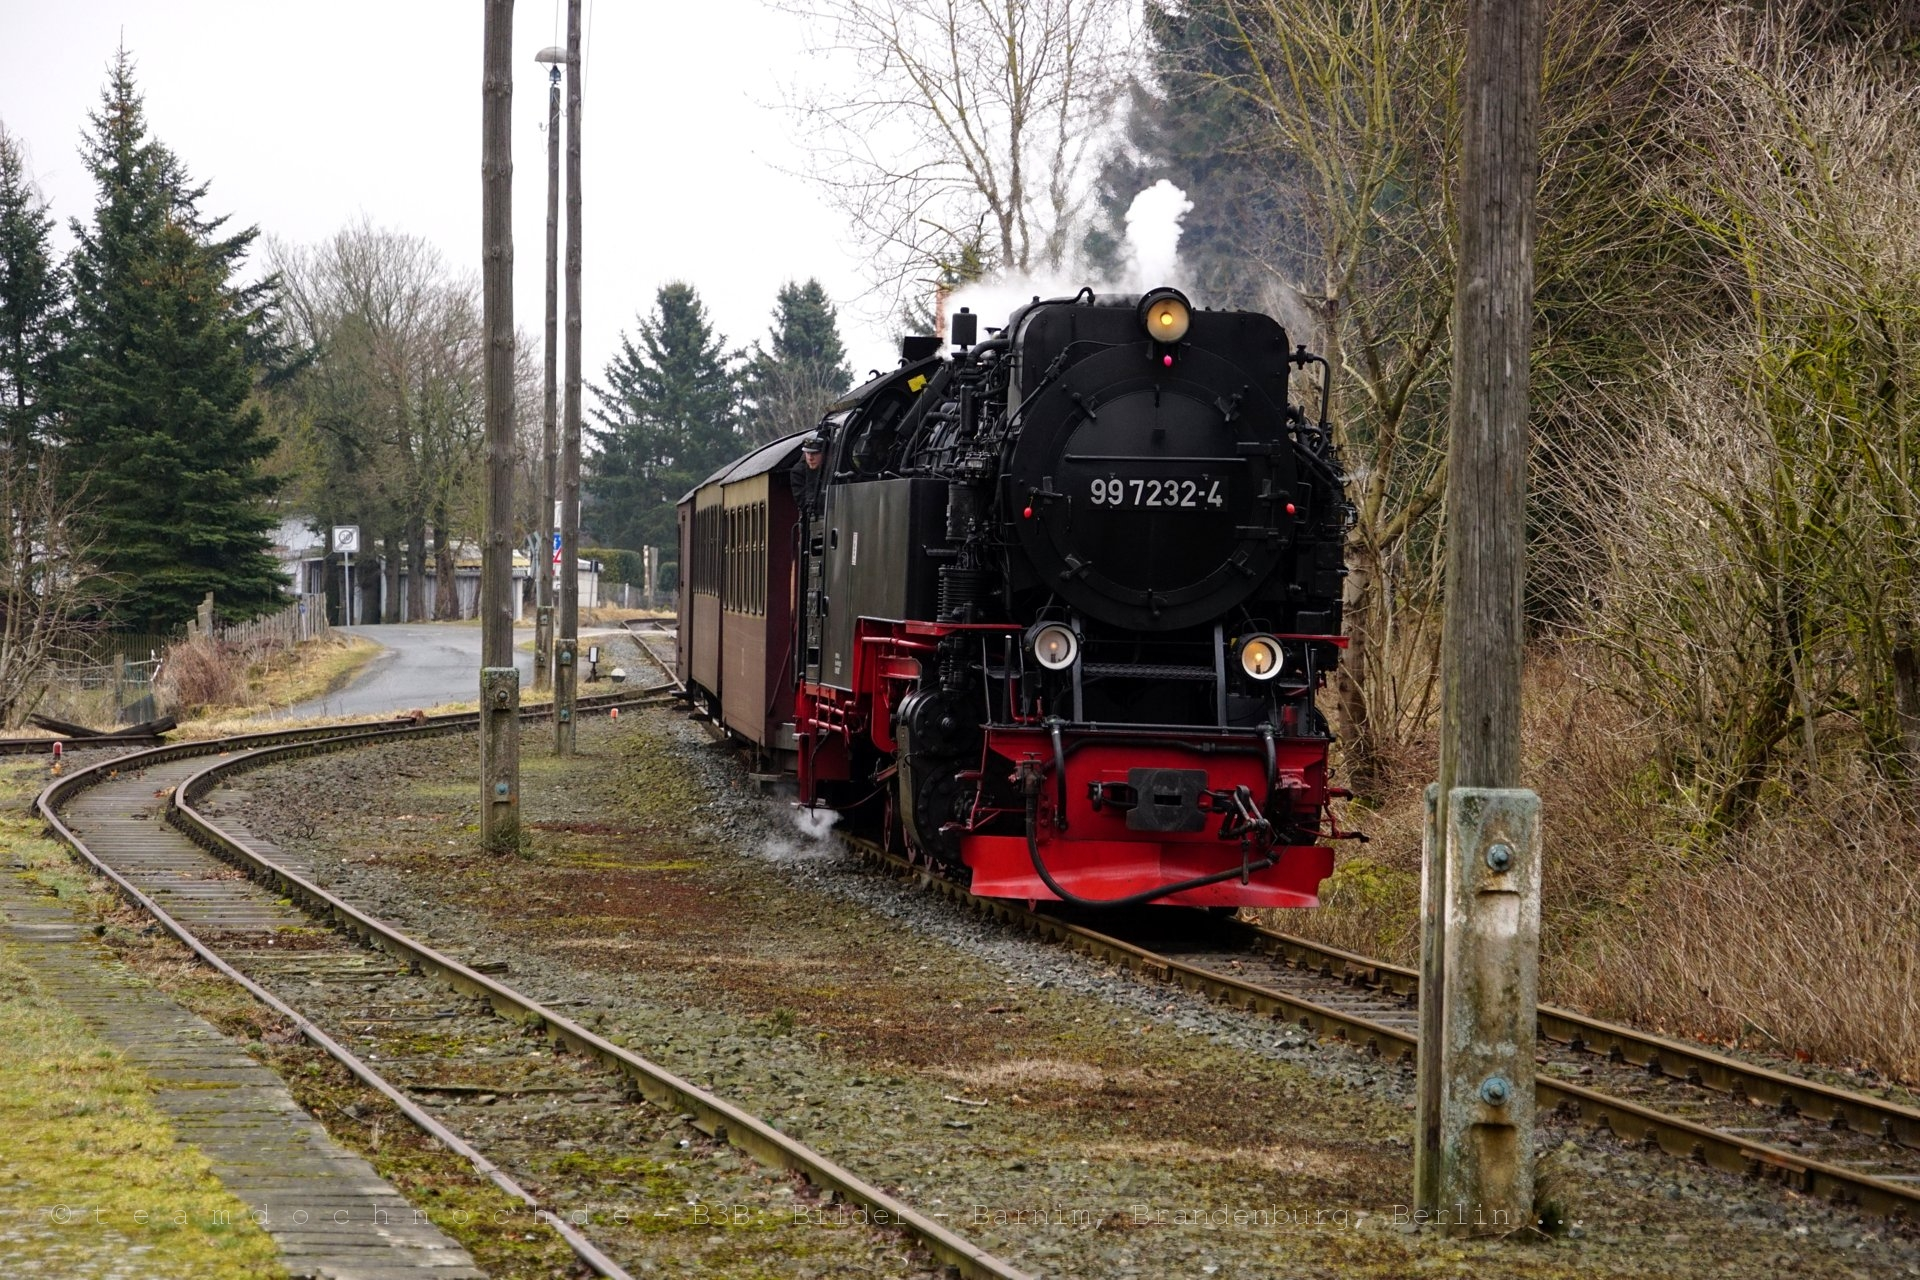 99 7232-4 bei Einfahrt in den Bahnhof Hasselfelde